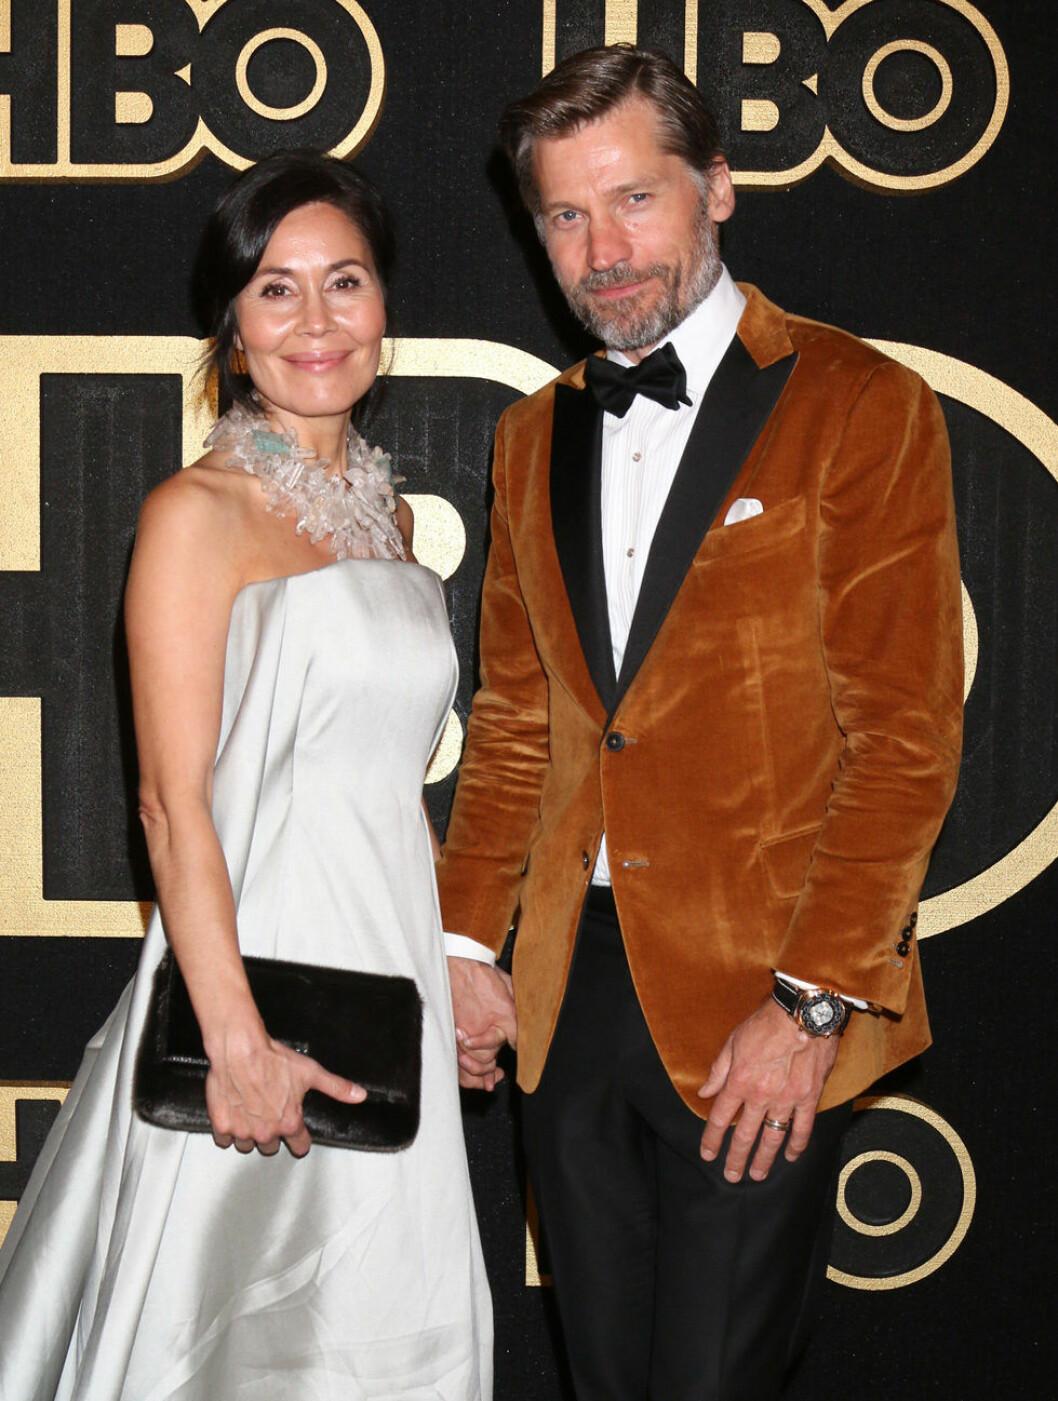 Nikolaj Coster-Waldau (Jamie Lannister i Game of Thrones) tillsammans med sin fru Nukaaka Coster Waldau på Emmy-galan 2018.